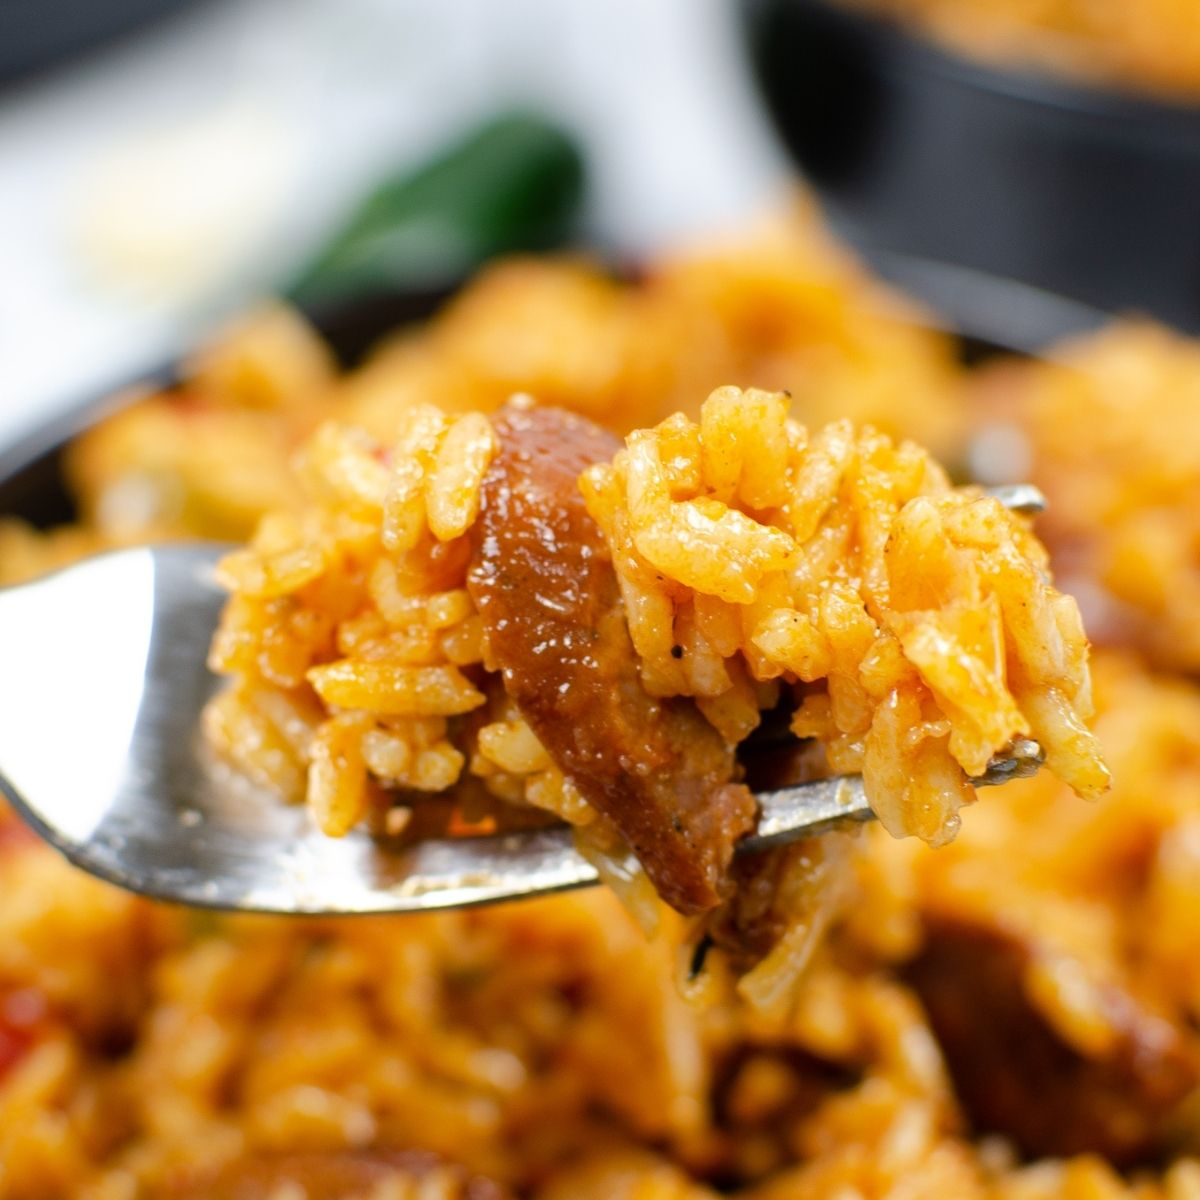 Sausage jambalaya on a fork - close up photo